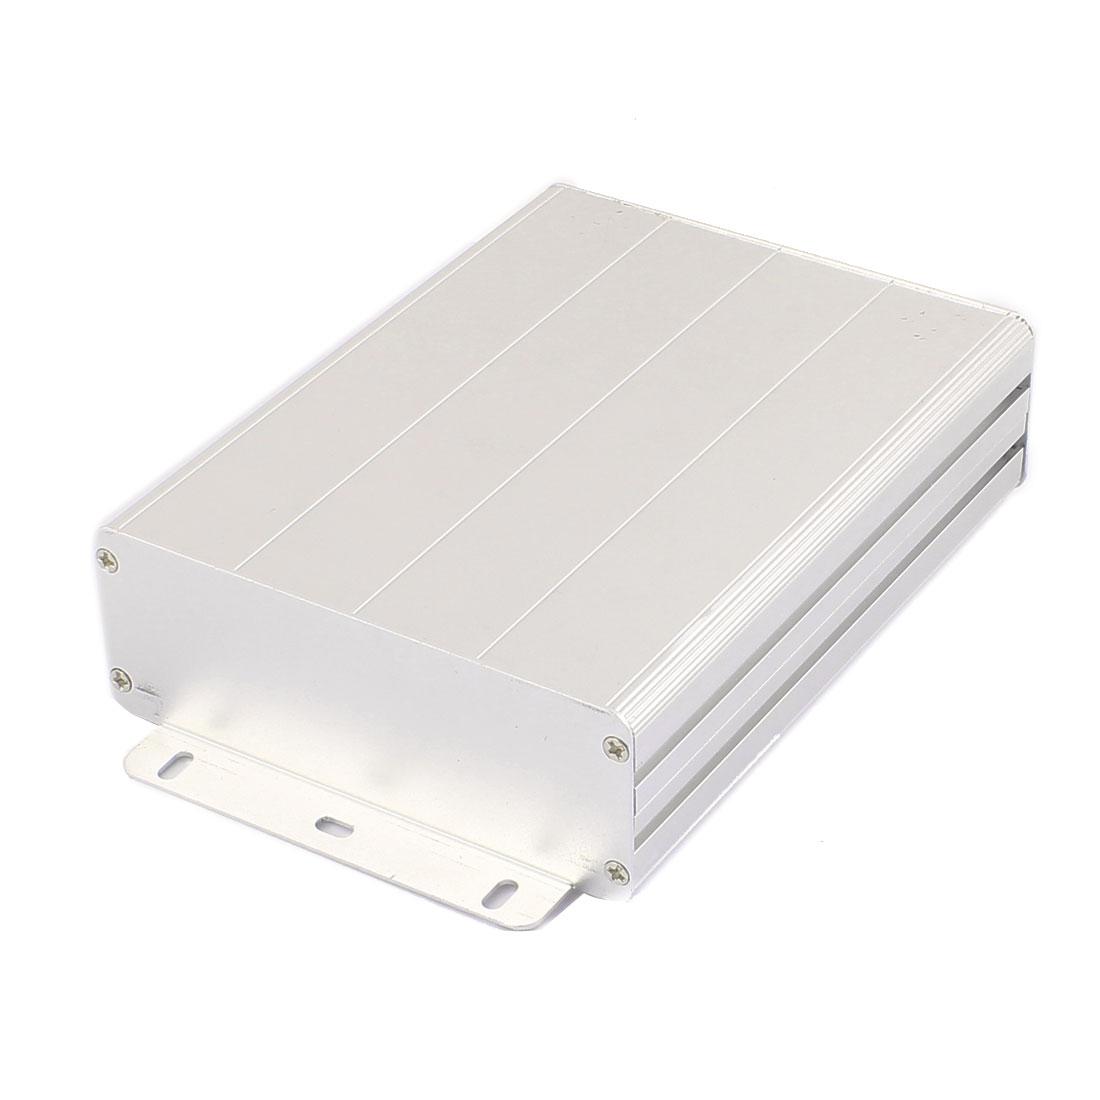 163 x 122 x 45mm Multi-purpose Electronic Extruded Aluminum Enclosure Silver Tone